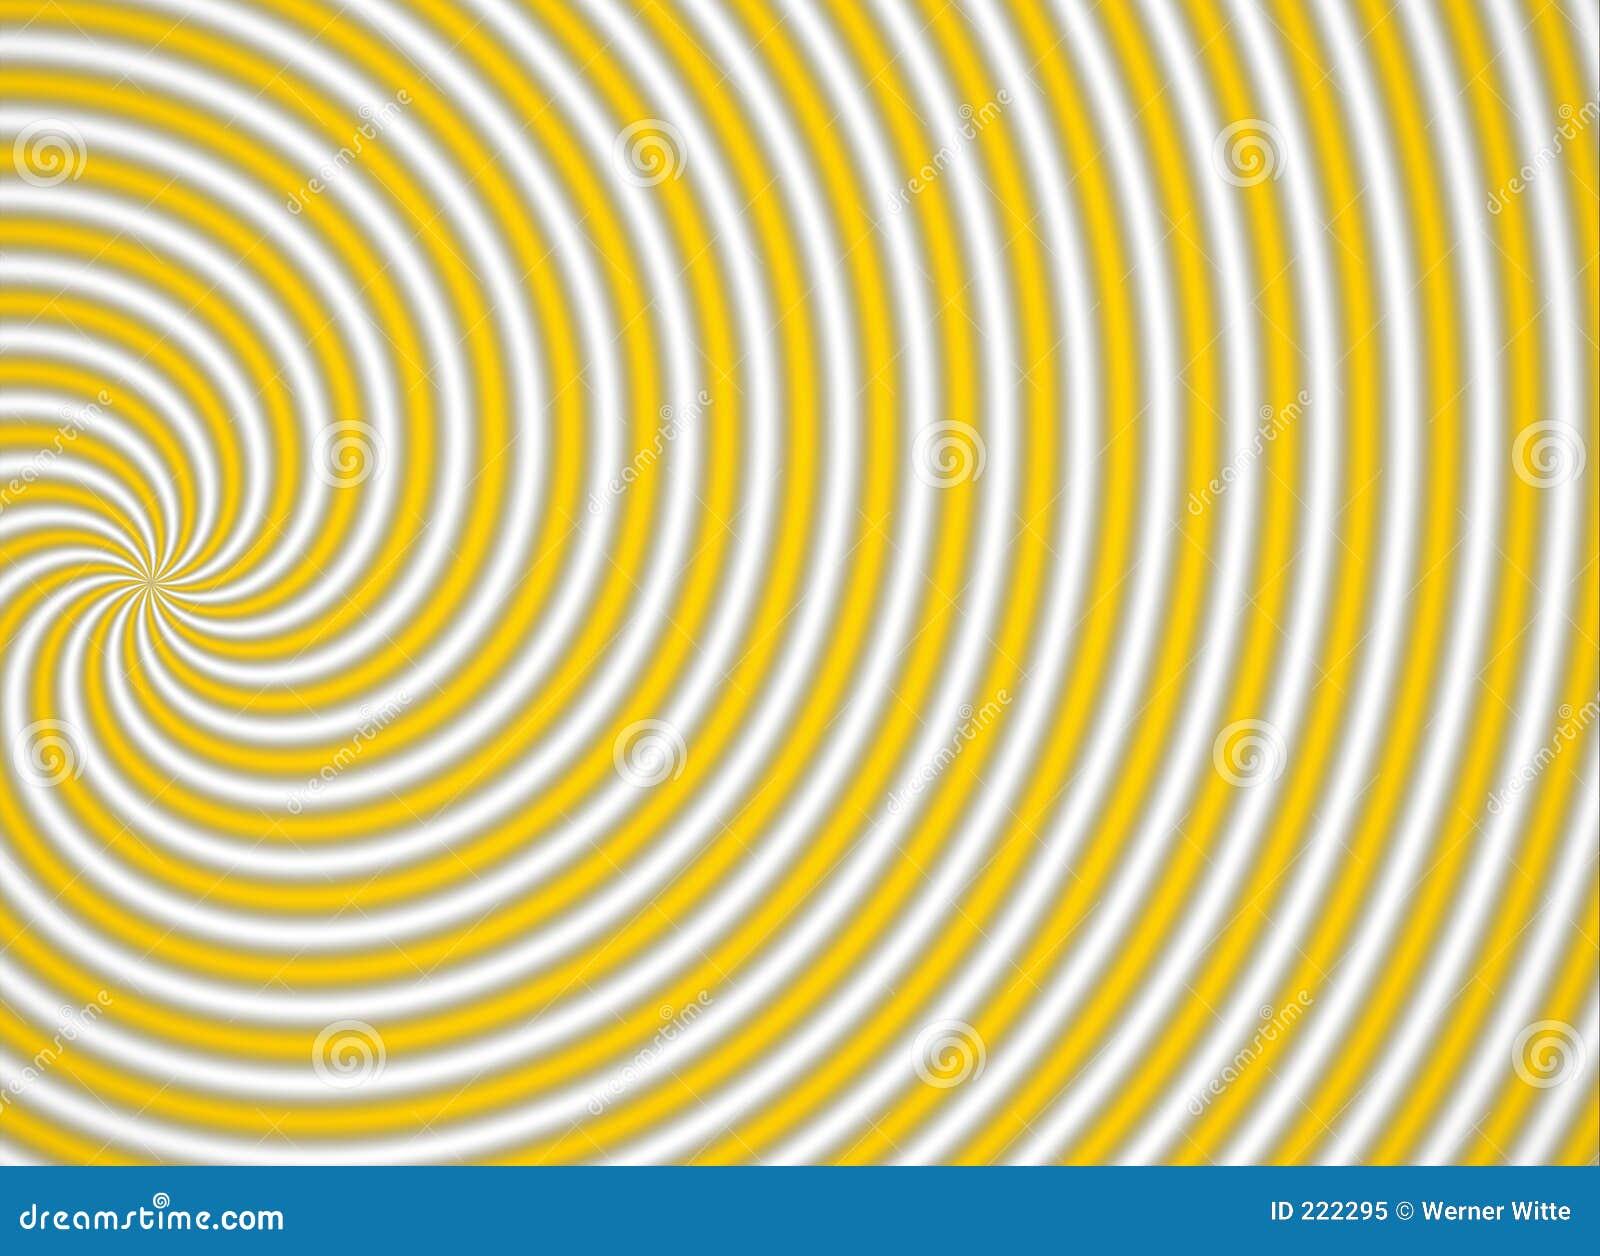 Multispiral żółty